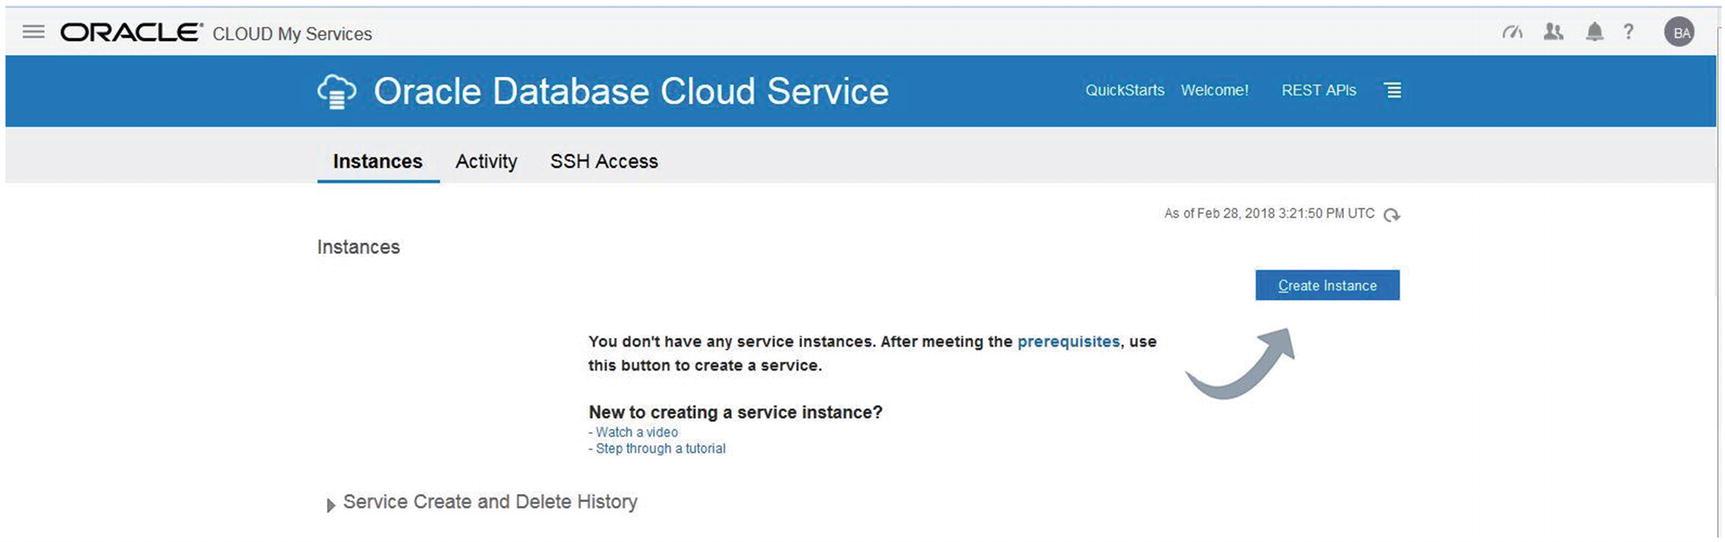 Oracle Cloud Overview | SpringerLink